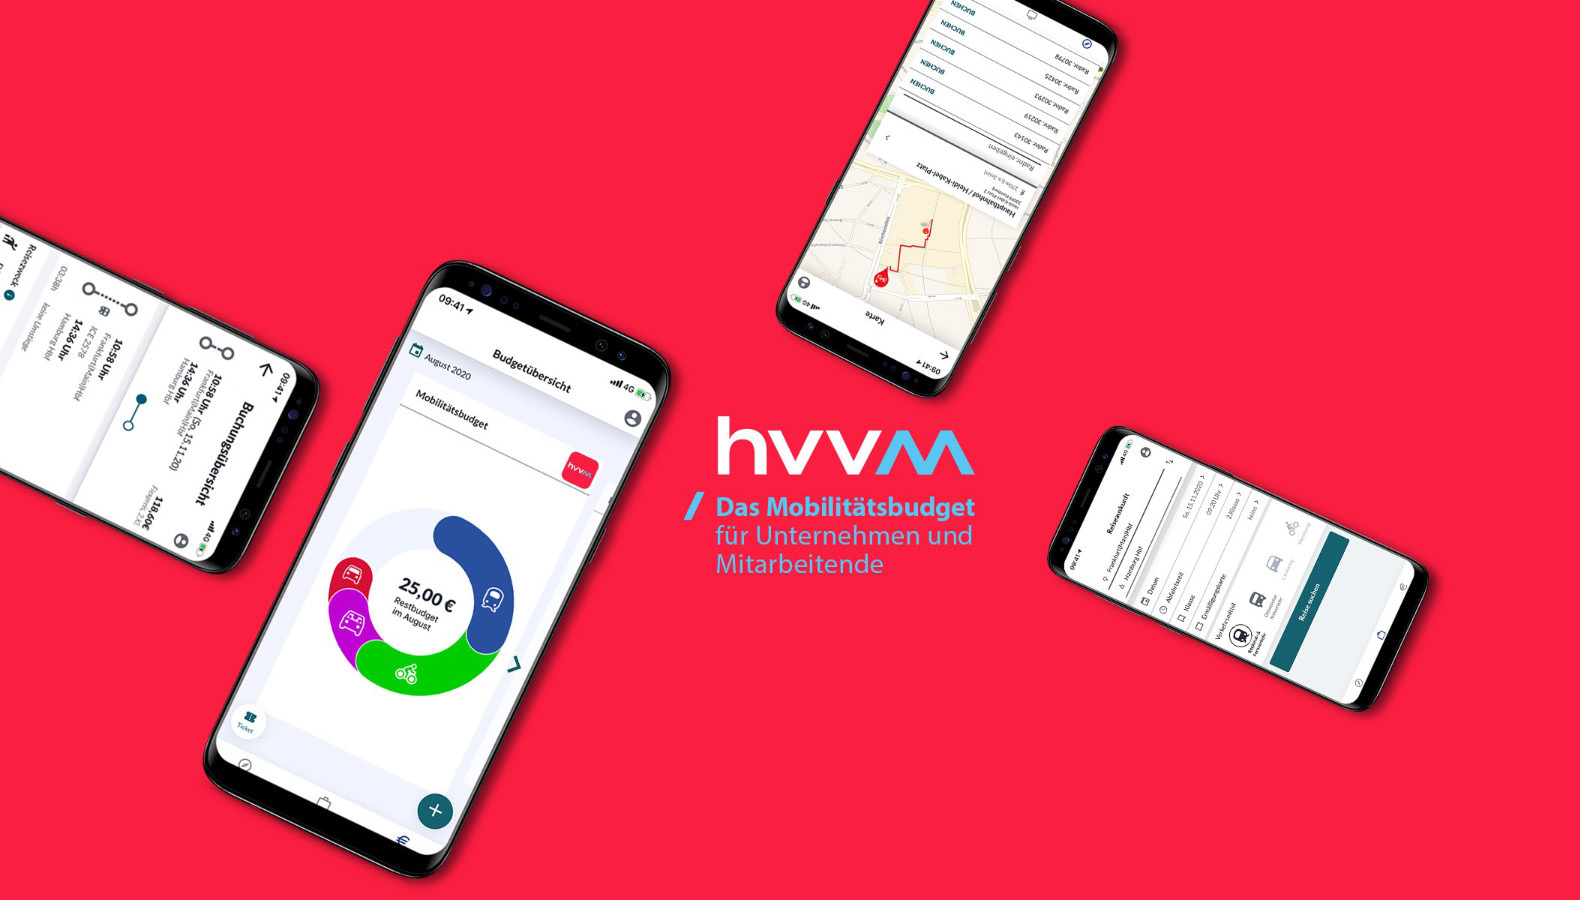 hvvm - Das Mobilitätsbudget